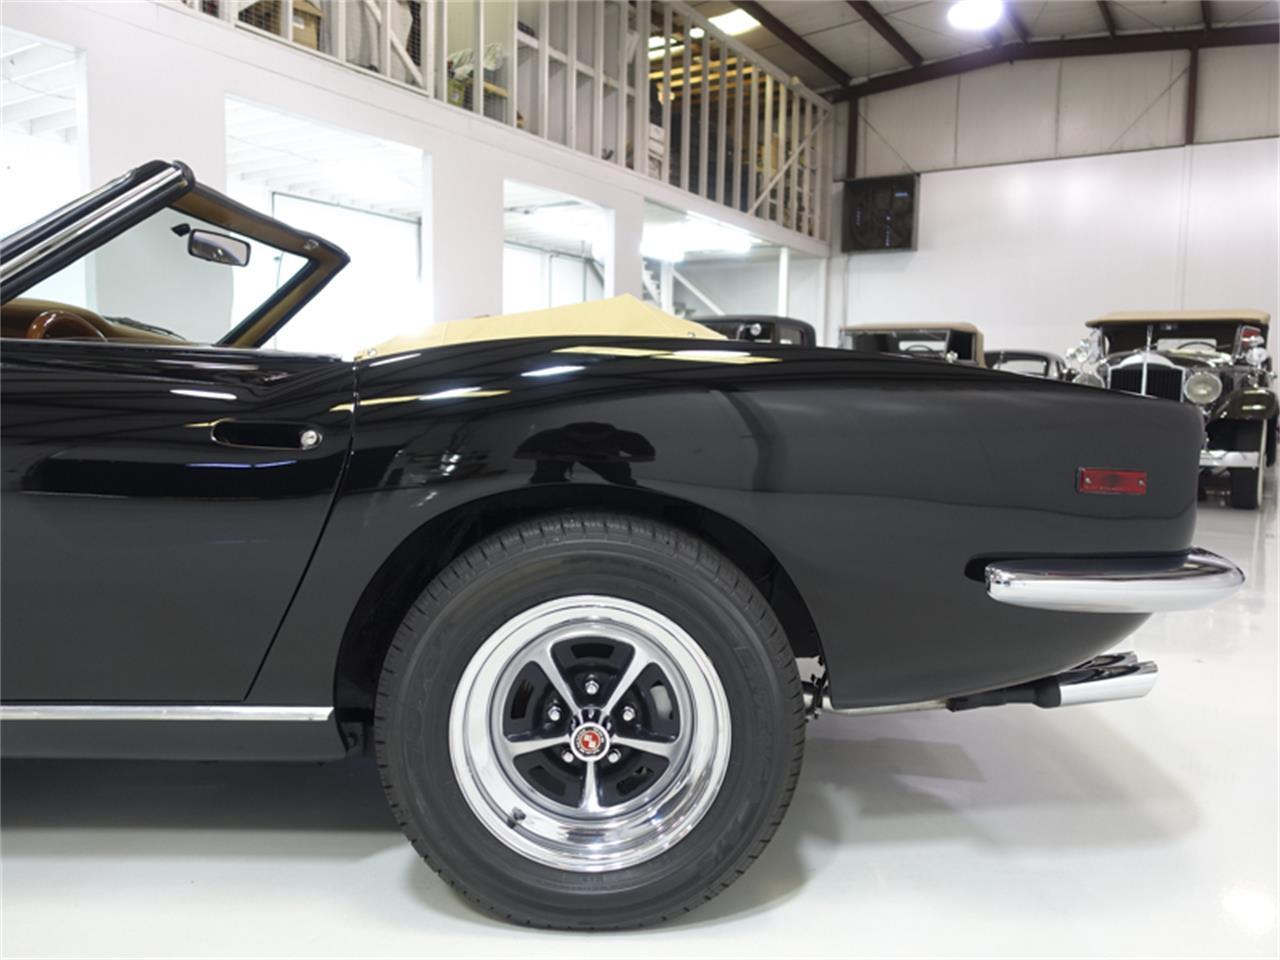 1969 Intermeccanica Italia (CC-1308440) for sale in Saint Louis, Missouri